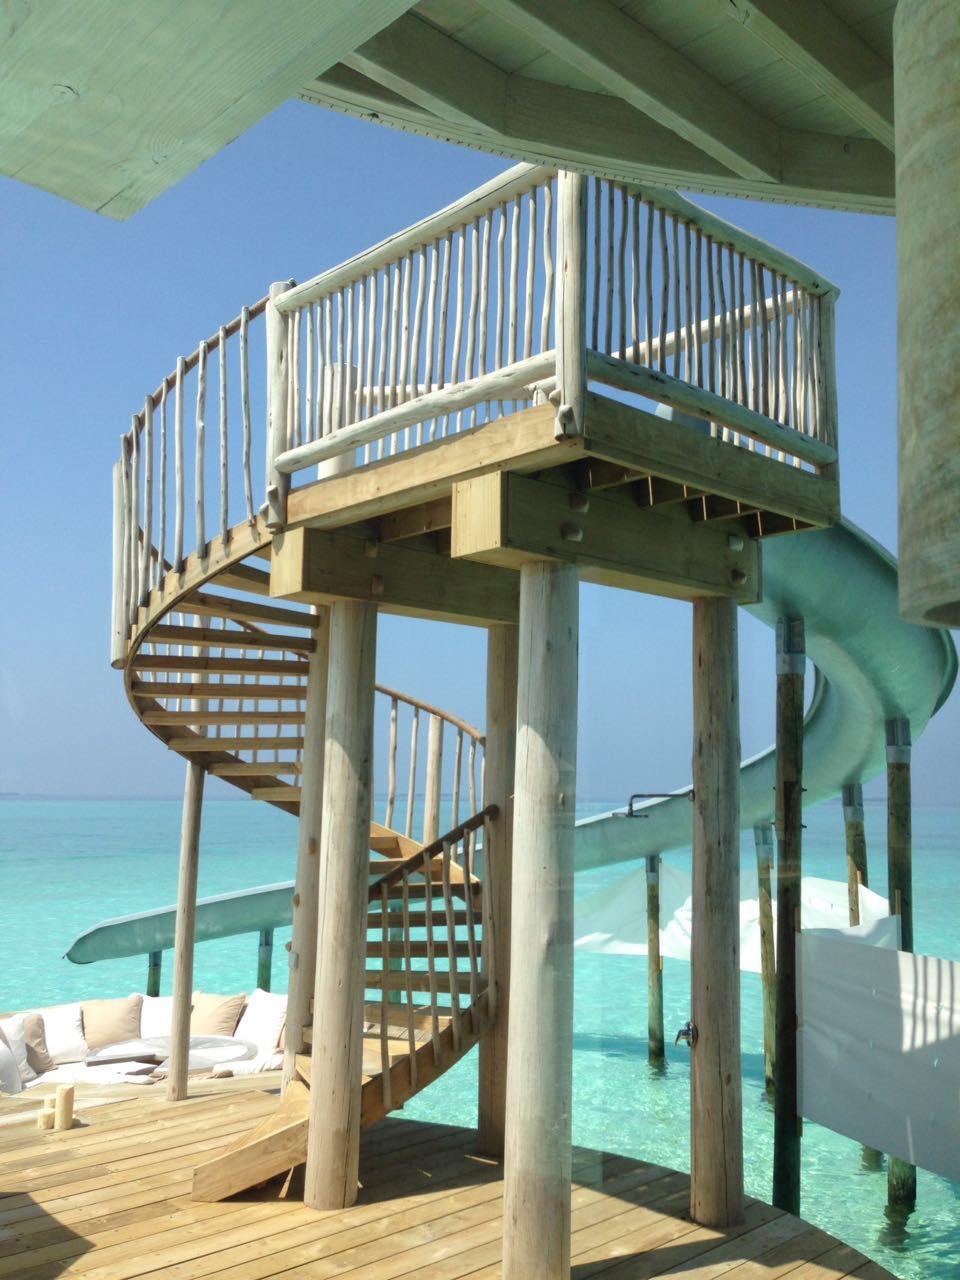 TUI-Berlin-Reisebüro-Maledivenexperten_Soneva-Jani-Resort-Reisebericht-Luxusreisen-Malediven